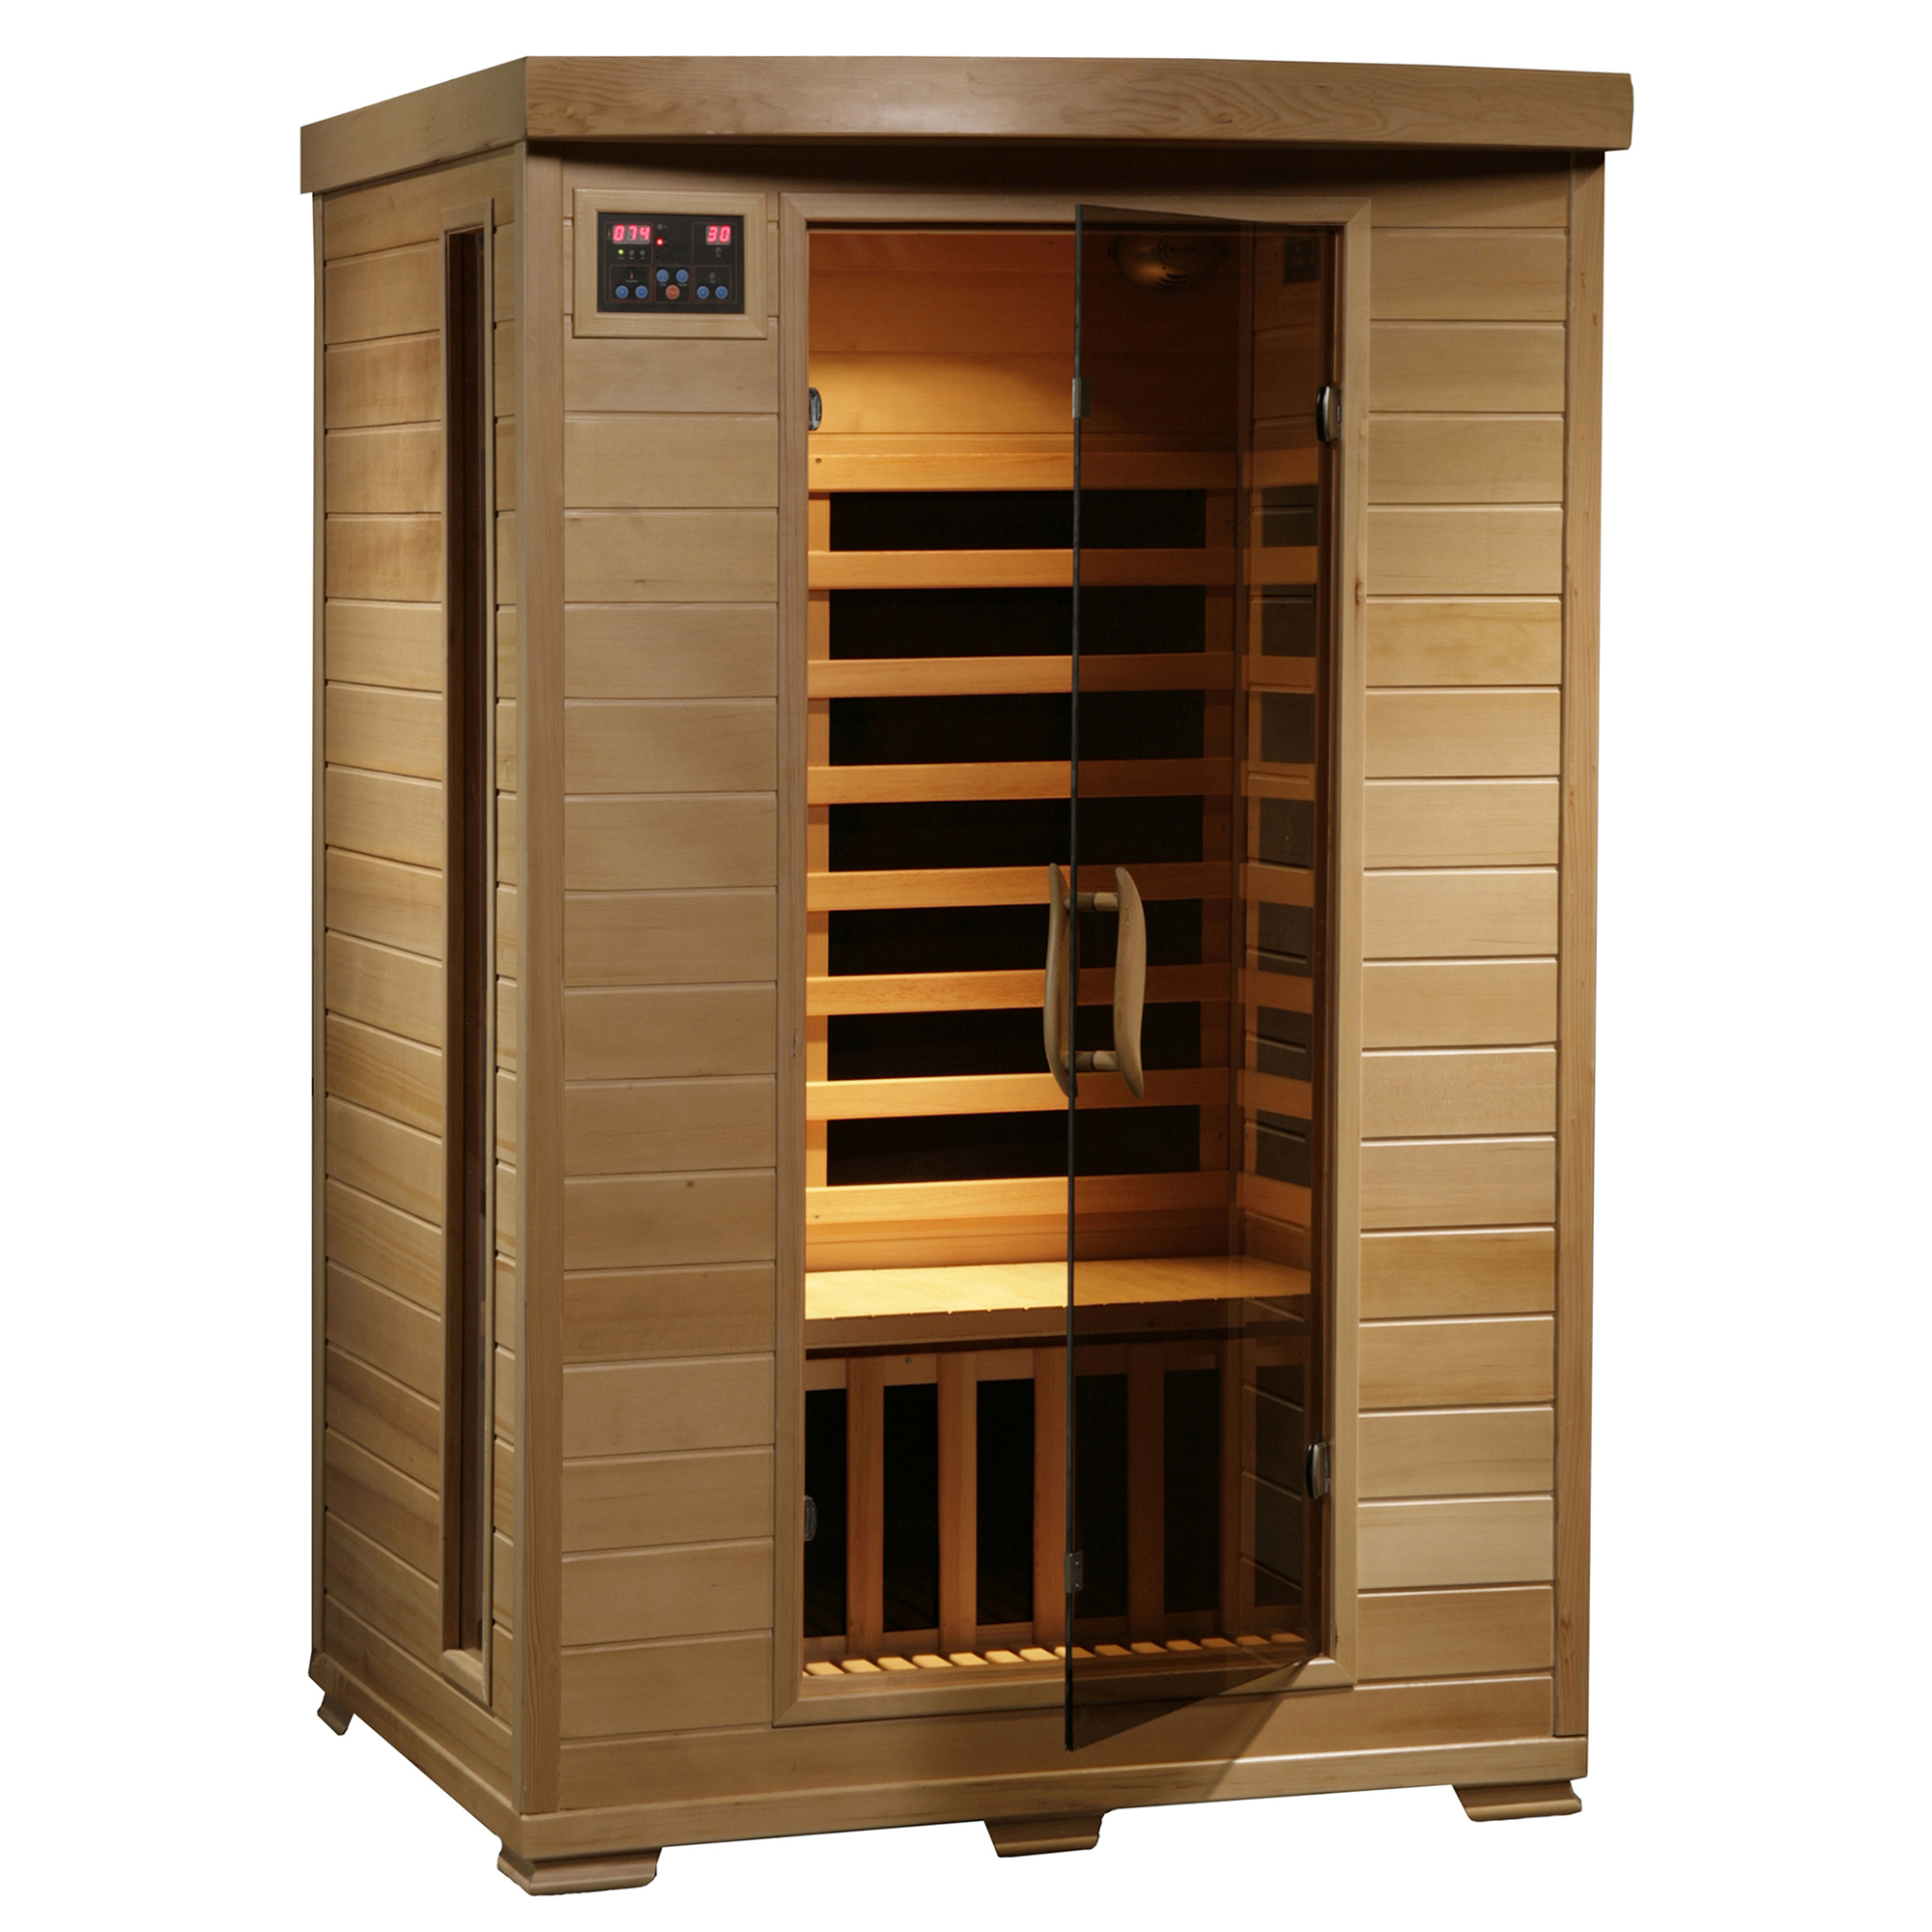 Radiant Saunas 2-Person Hemlock Deluxe Infrared Sauna w/ 6 Carbon Heaters